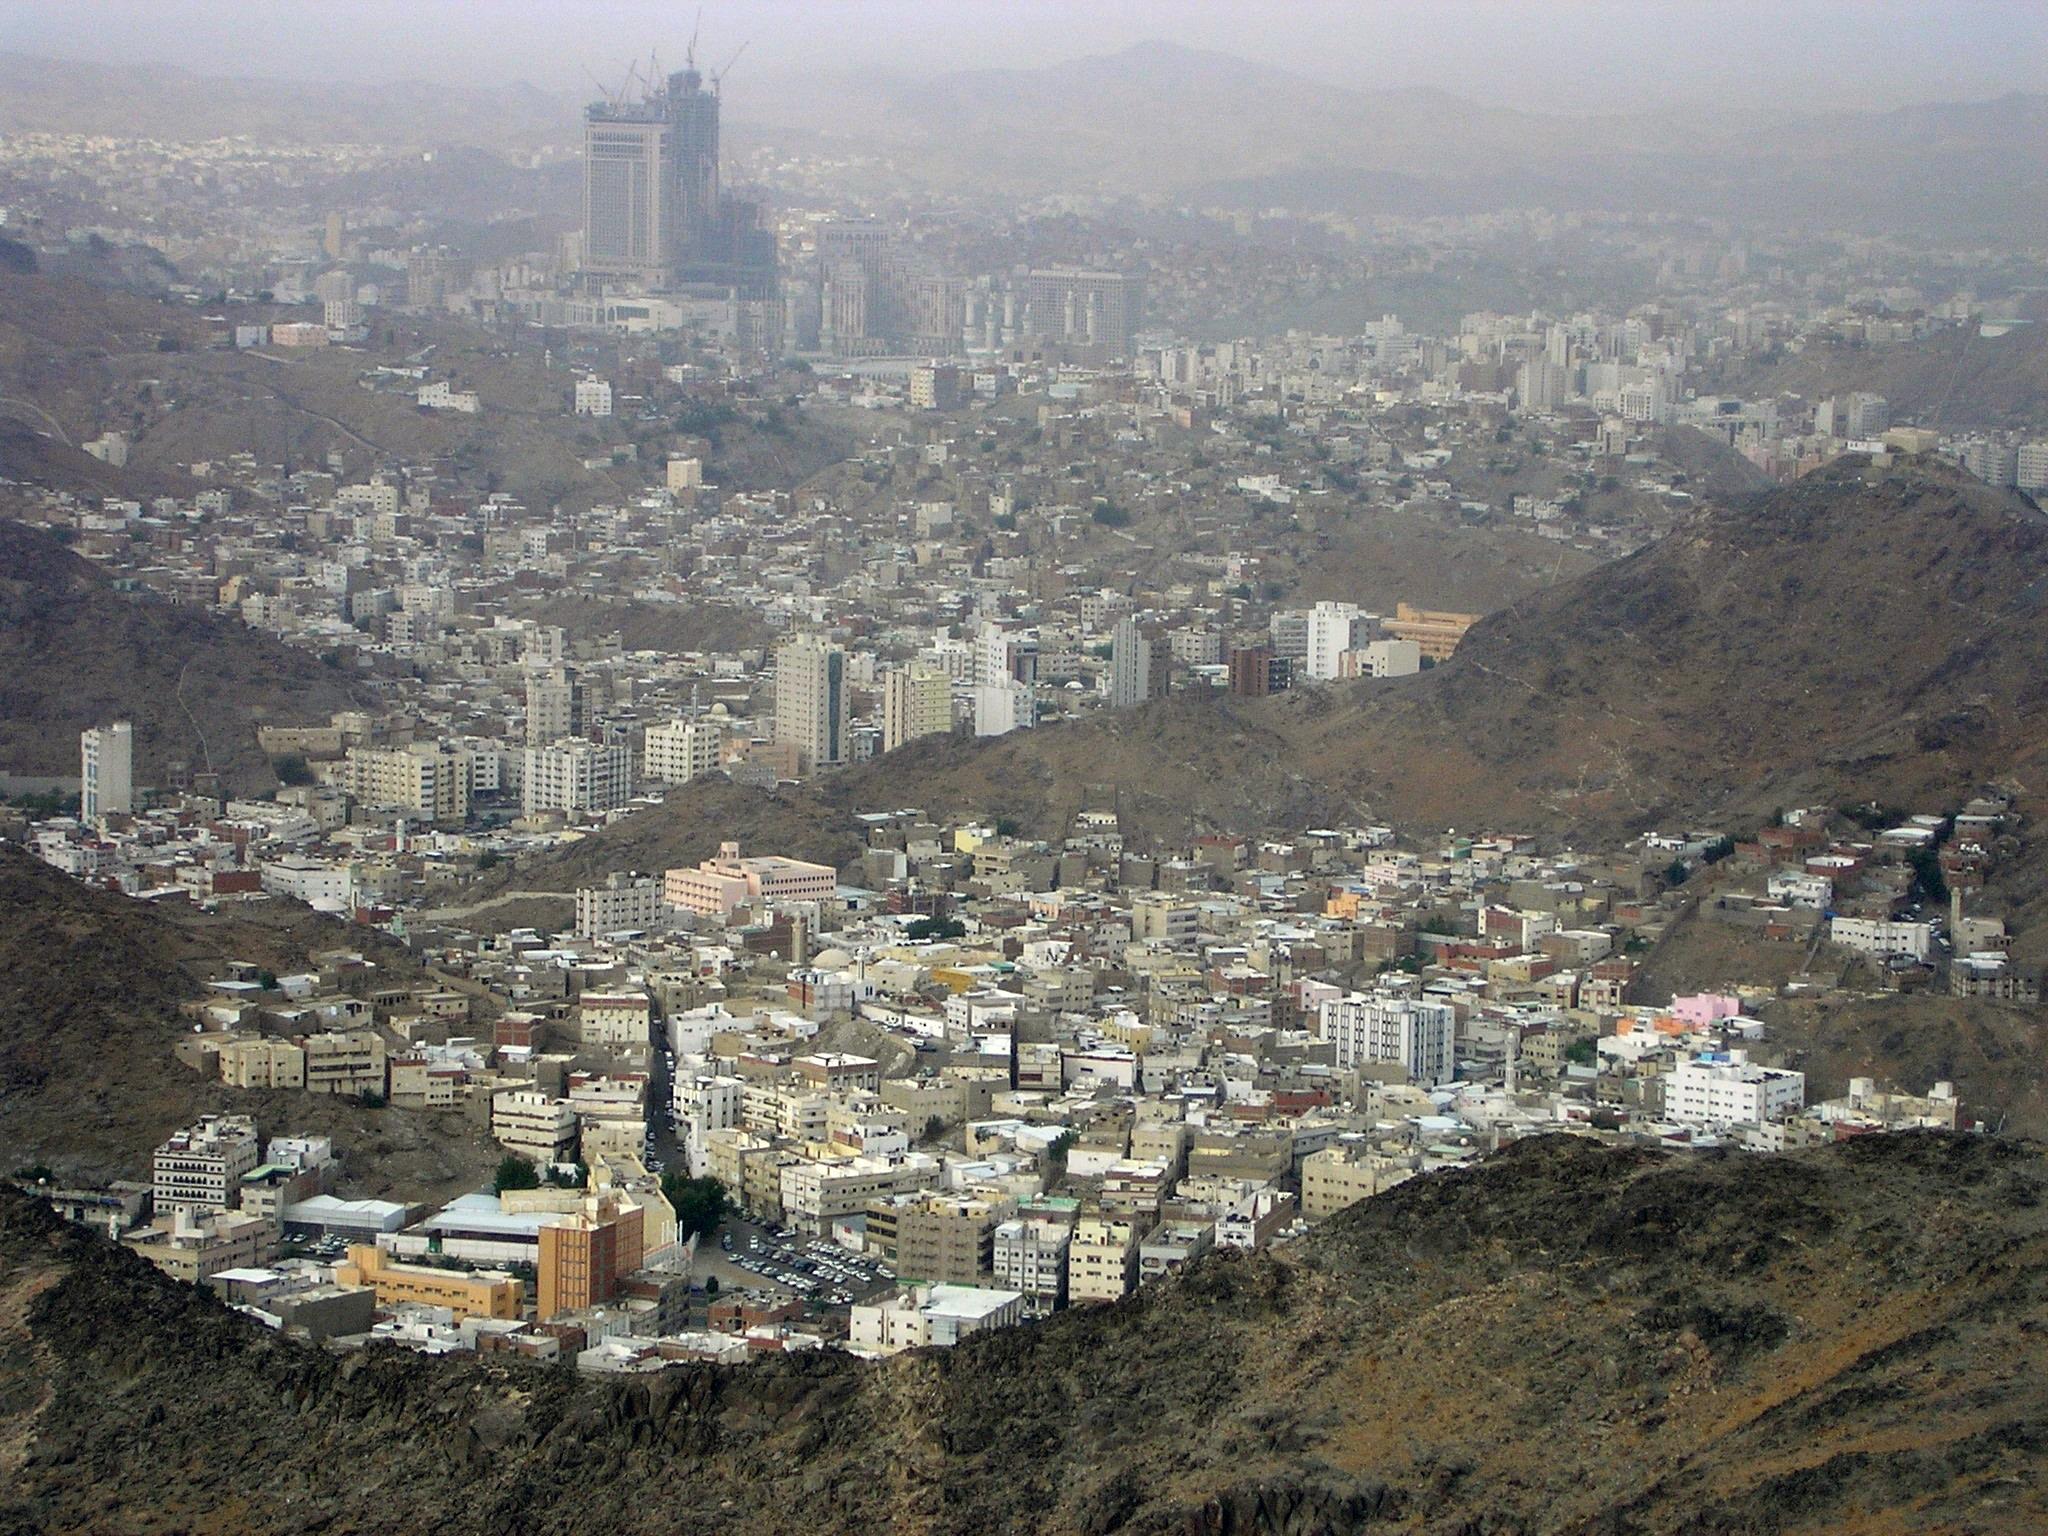 Mecca, as seen from Jabal al-Nour, Photo taken on April 9, 2006.